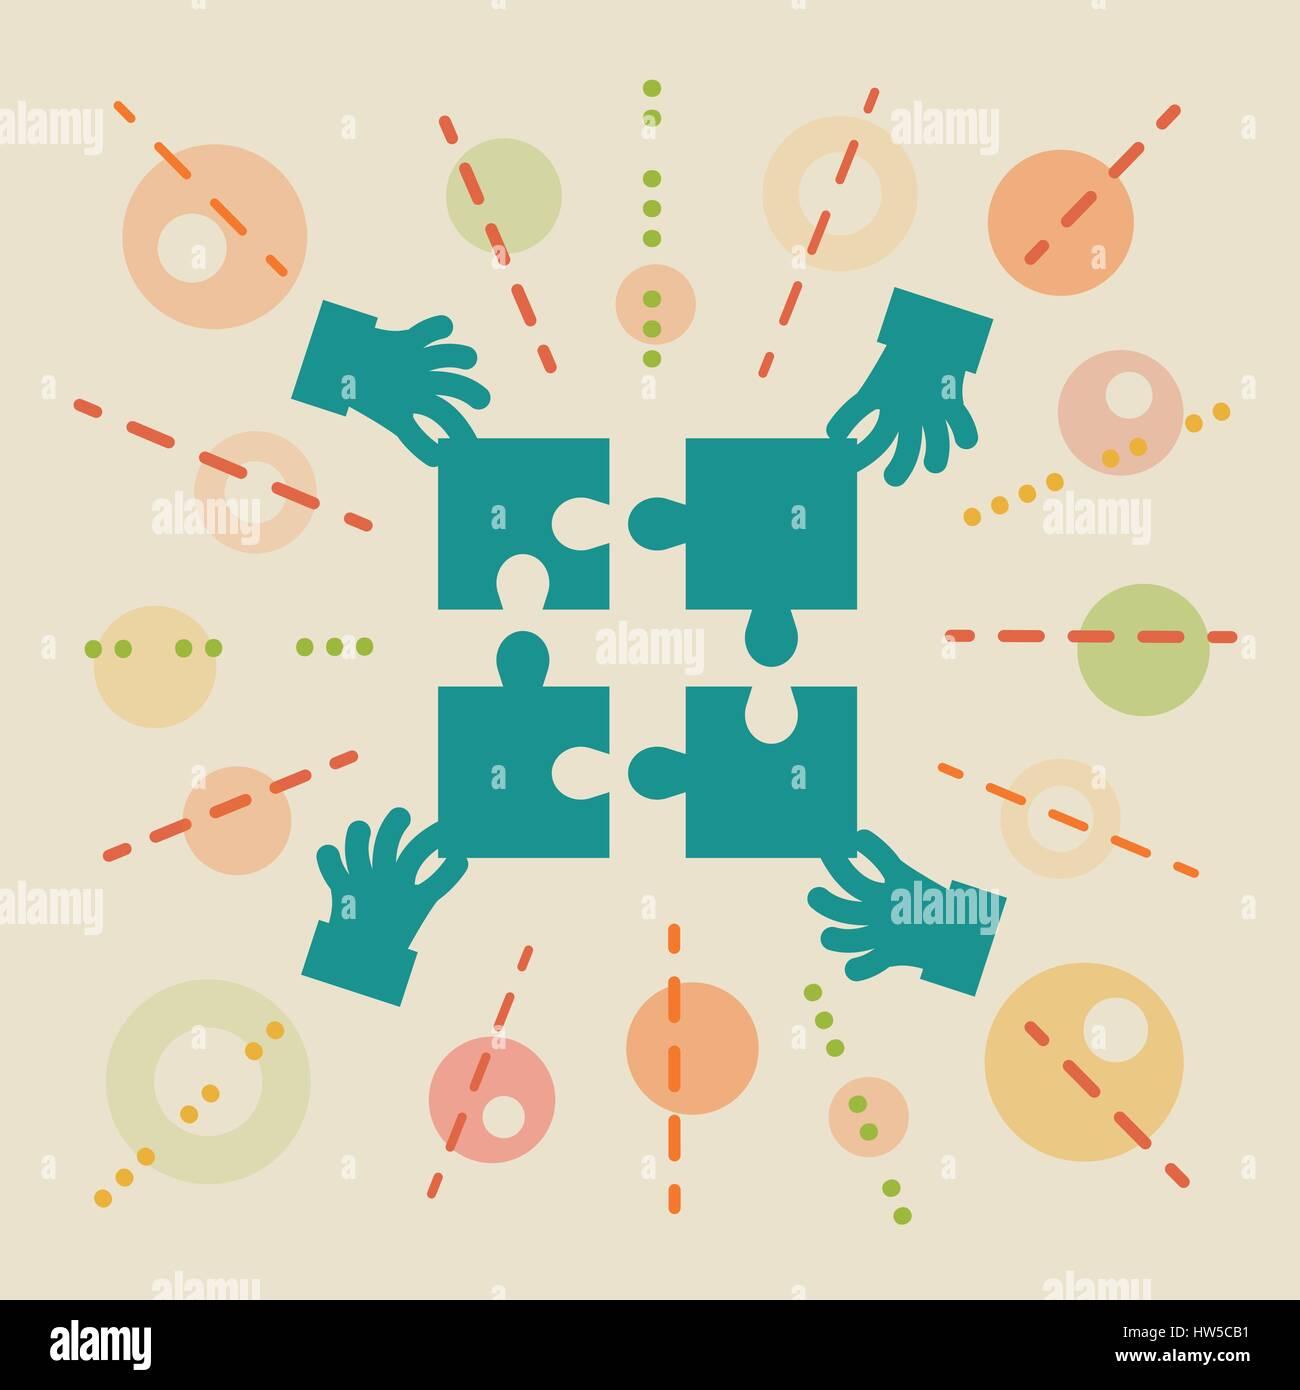 Teamwork. Concept business illustration Stock Vector